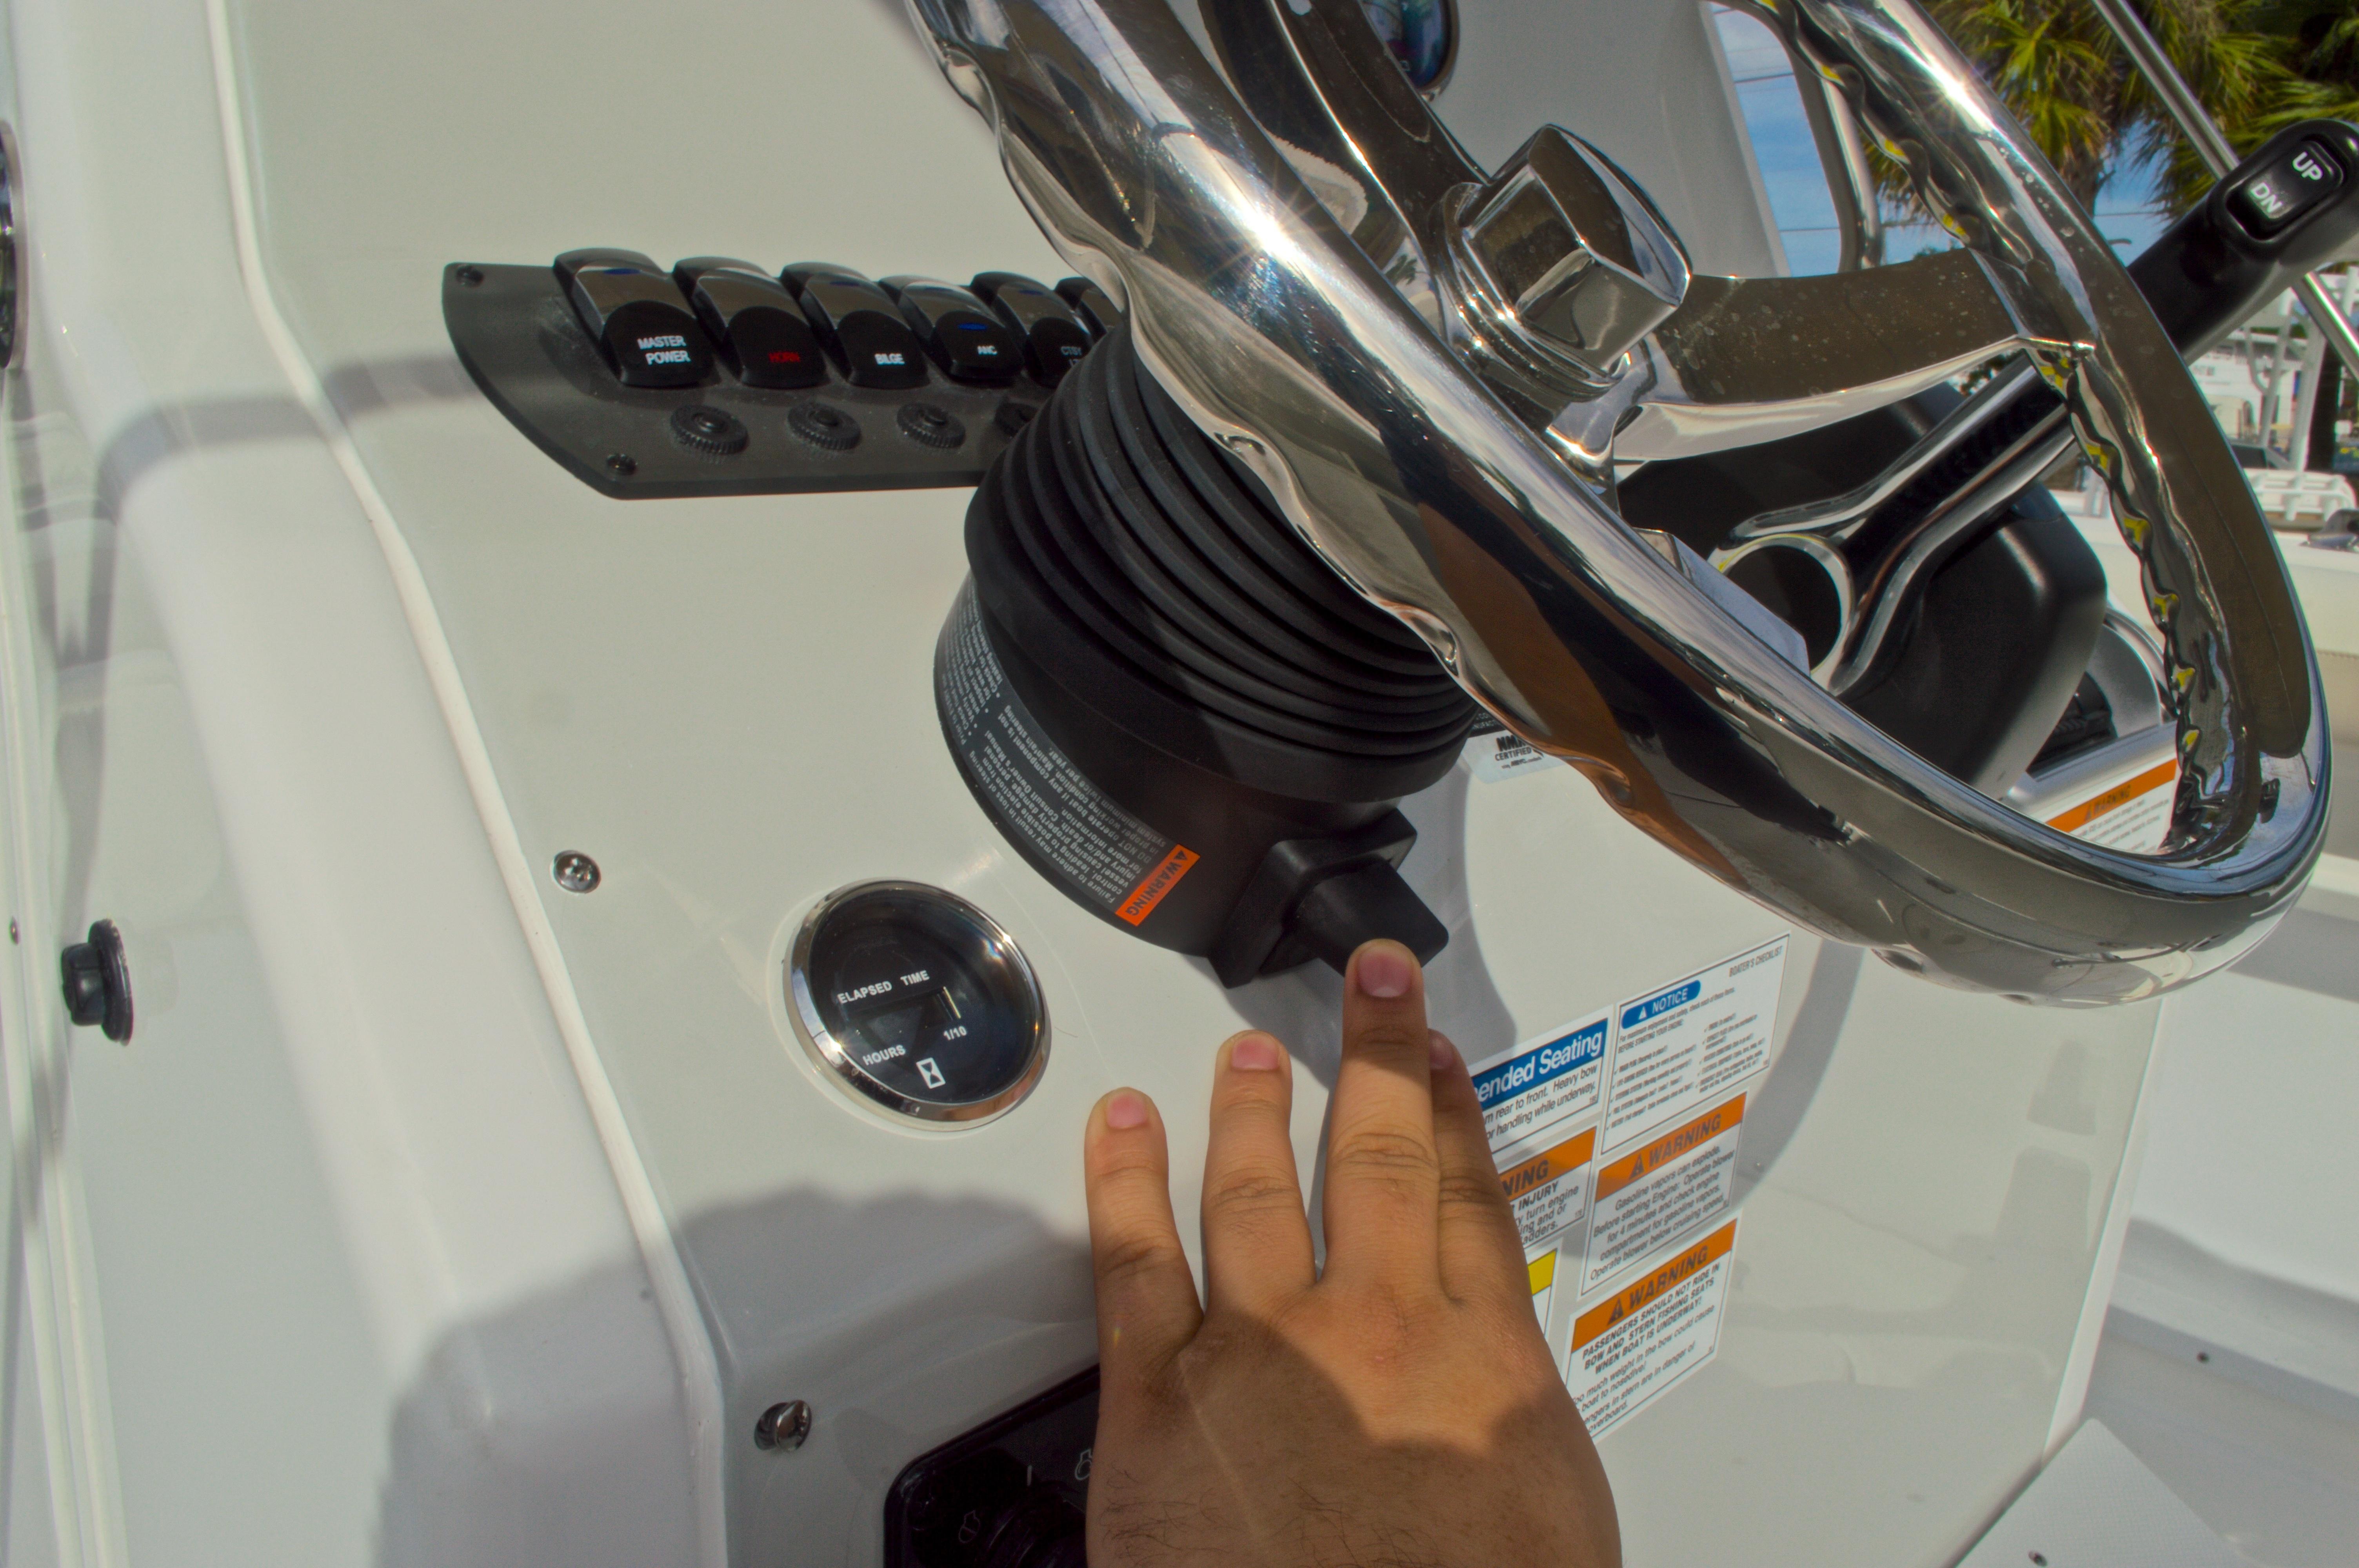 Thumbnail 38 for New 2016 Hurricane CC21 Center Console boat for sale in Vero Beach, FL